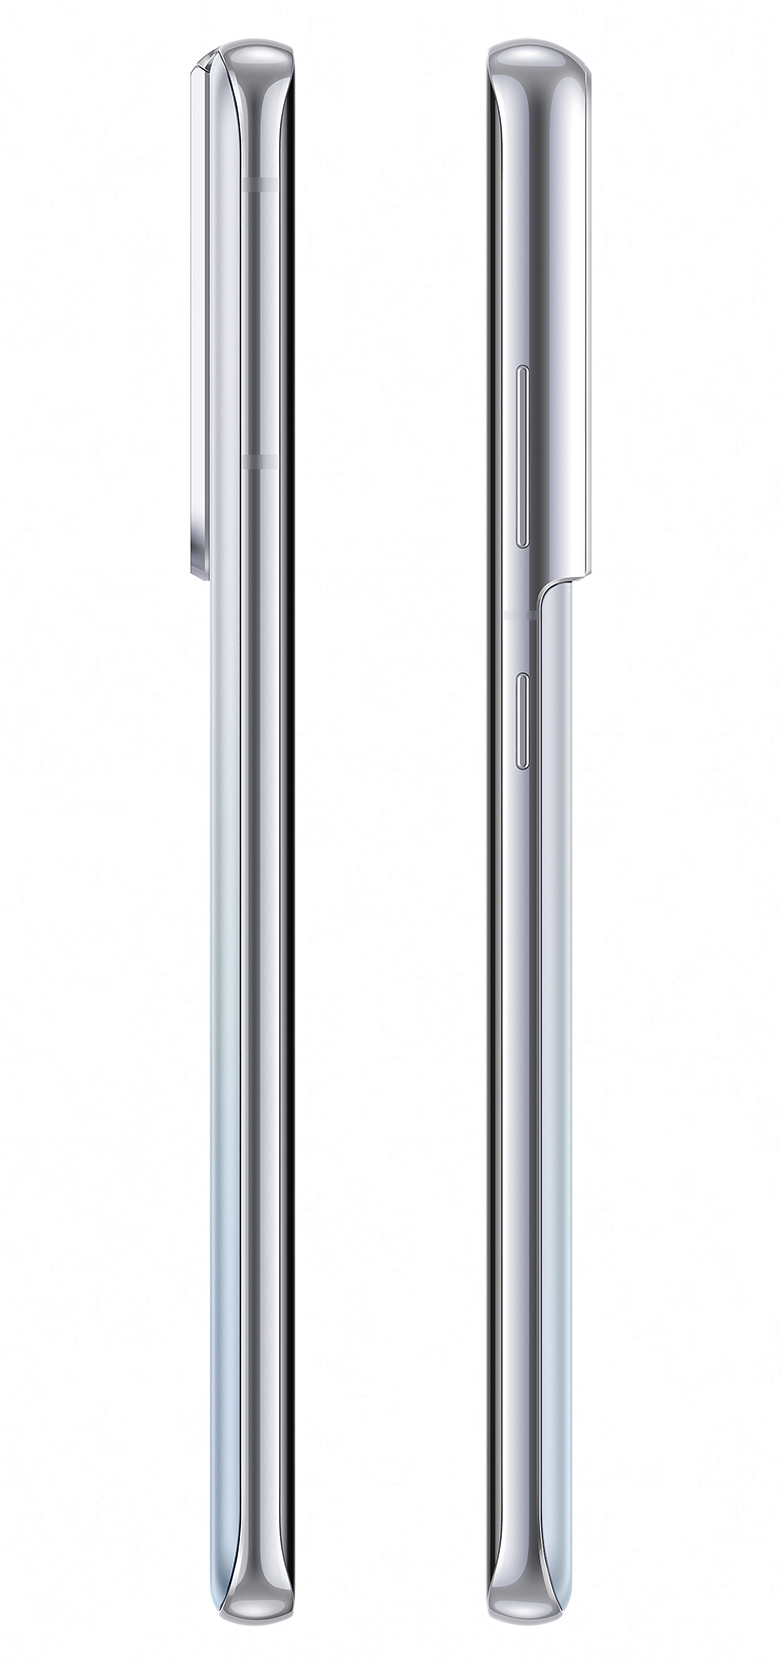 Samsung Galaxy S21 Ultra 5G Phantom Silver 12GB RAM |256GB